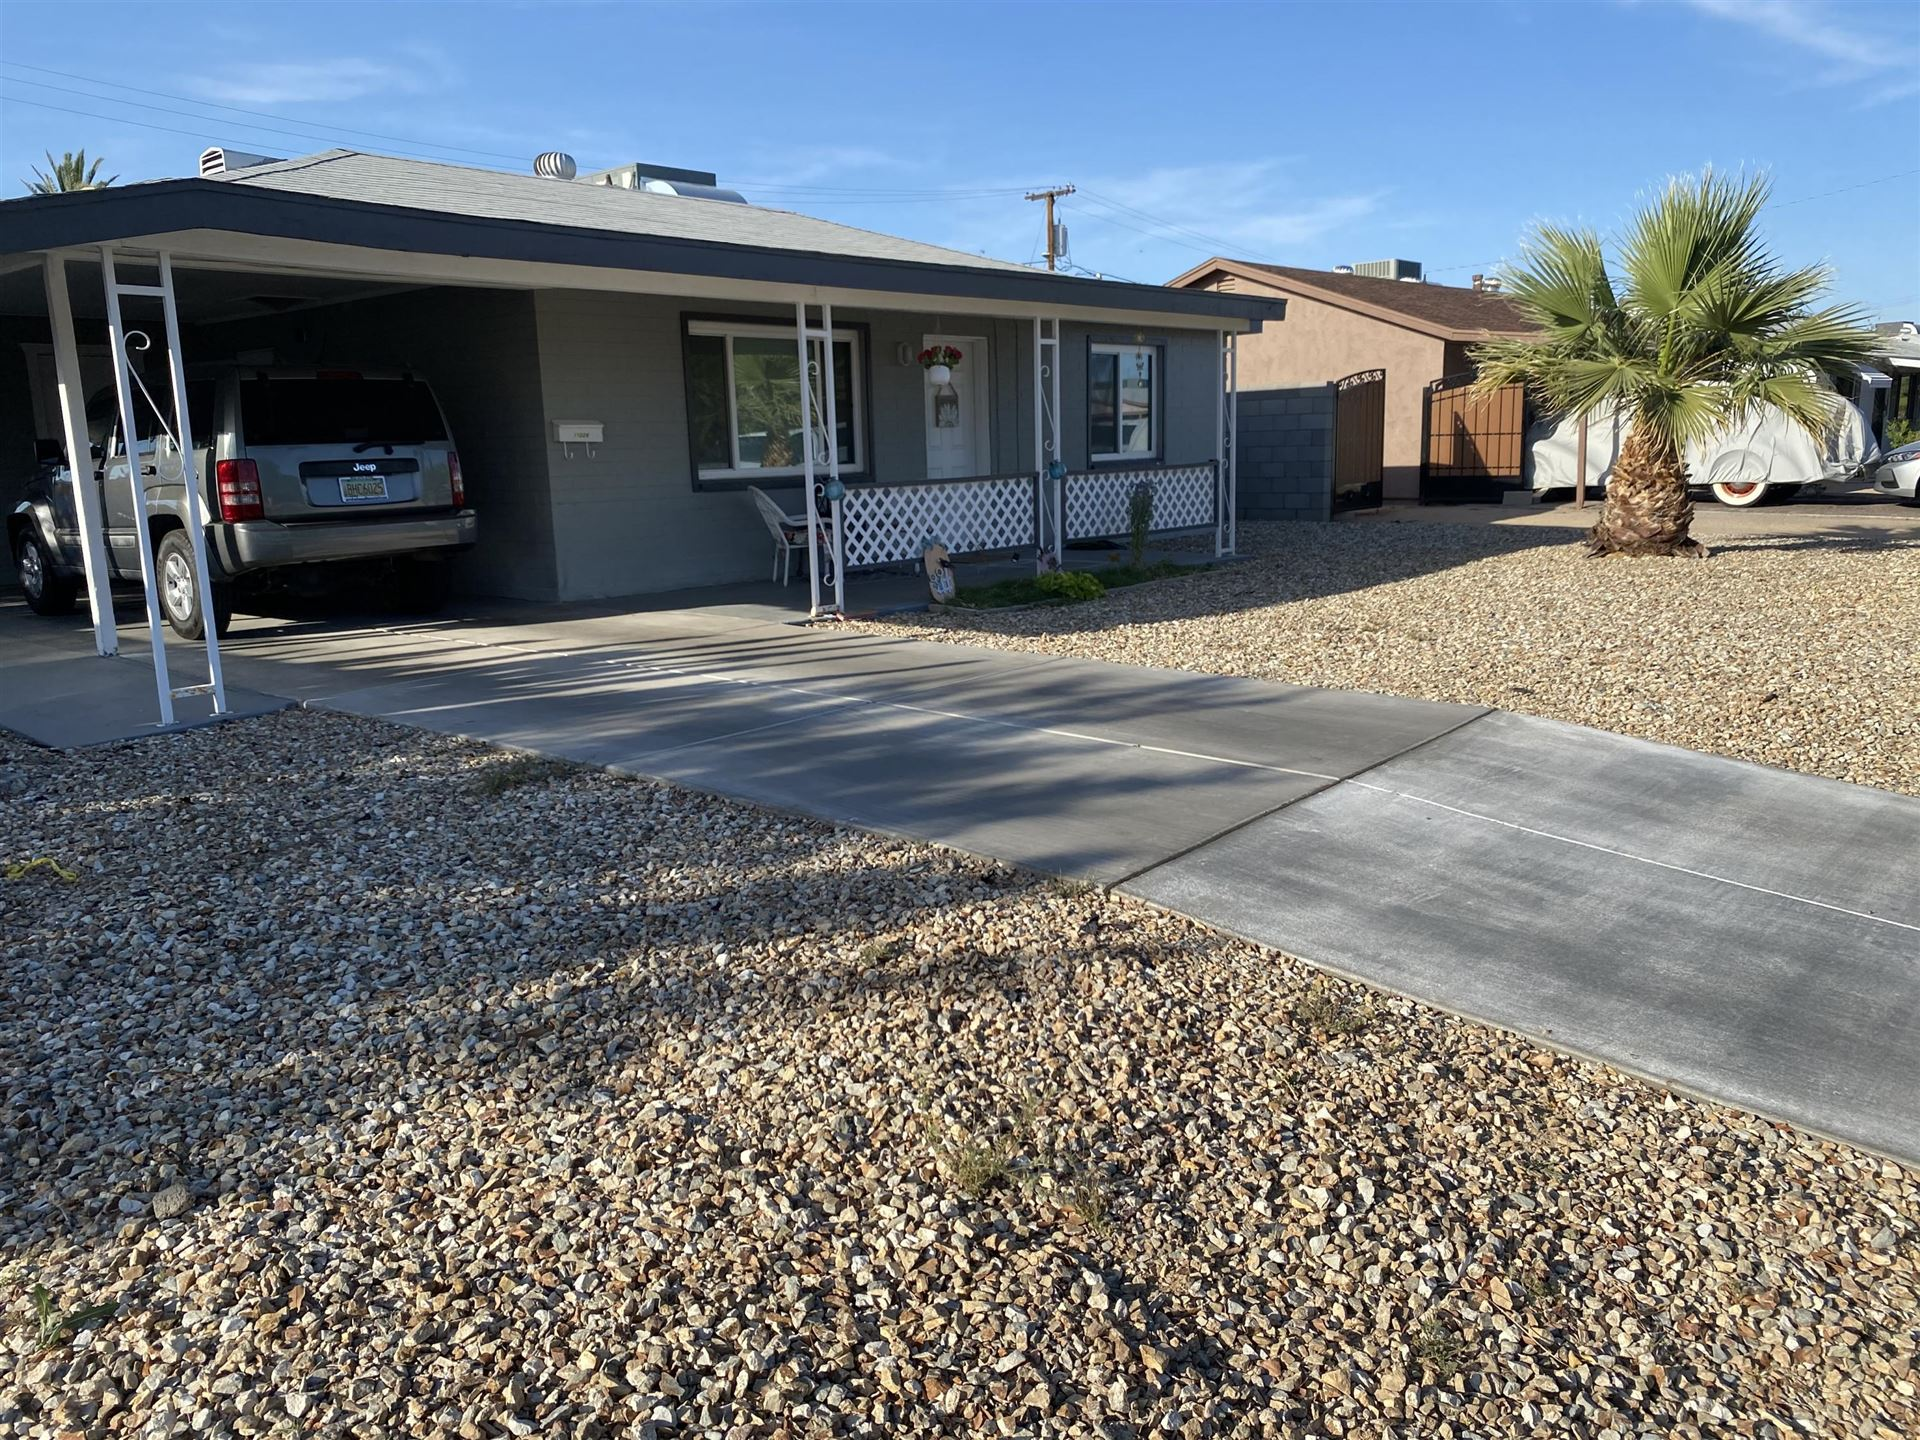 Photo of 11228 W LOUISIANA Avenue, Youngtown, AZ 85363 (MLS # 6229378)